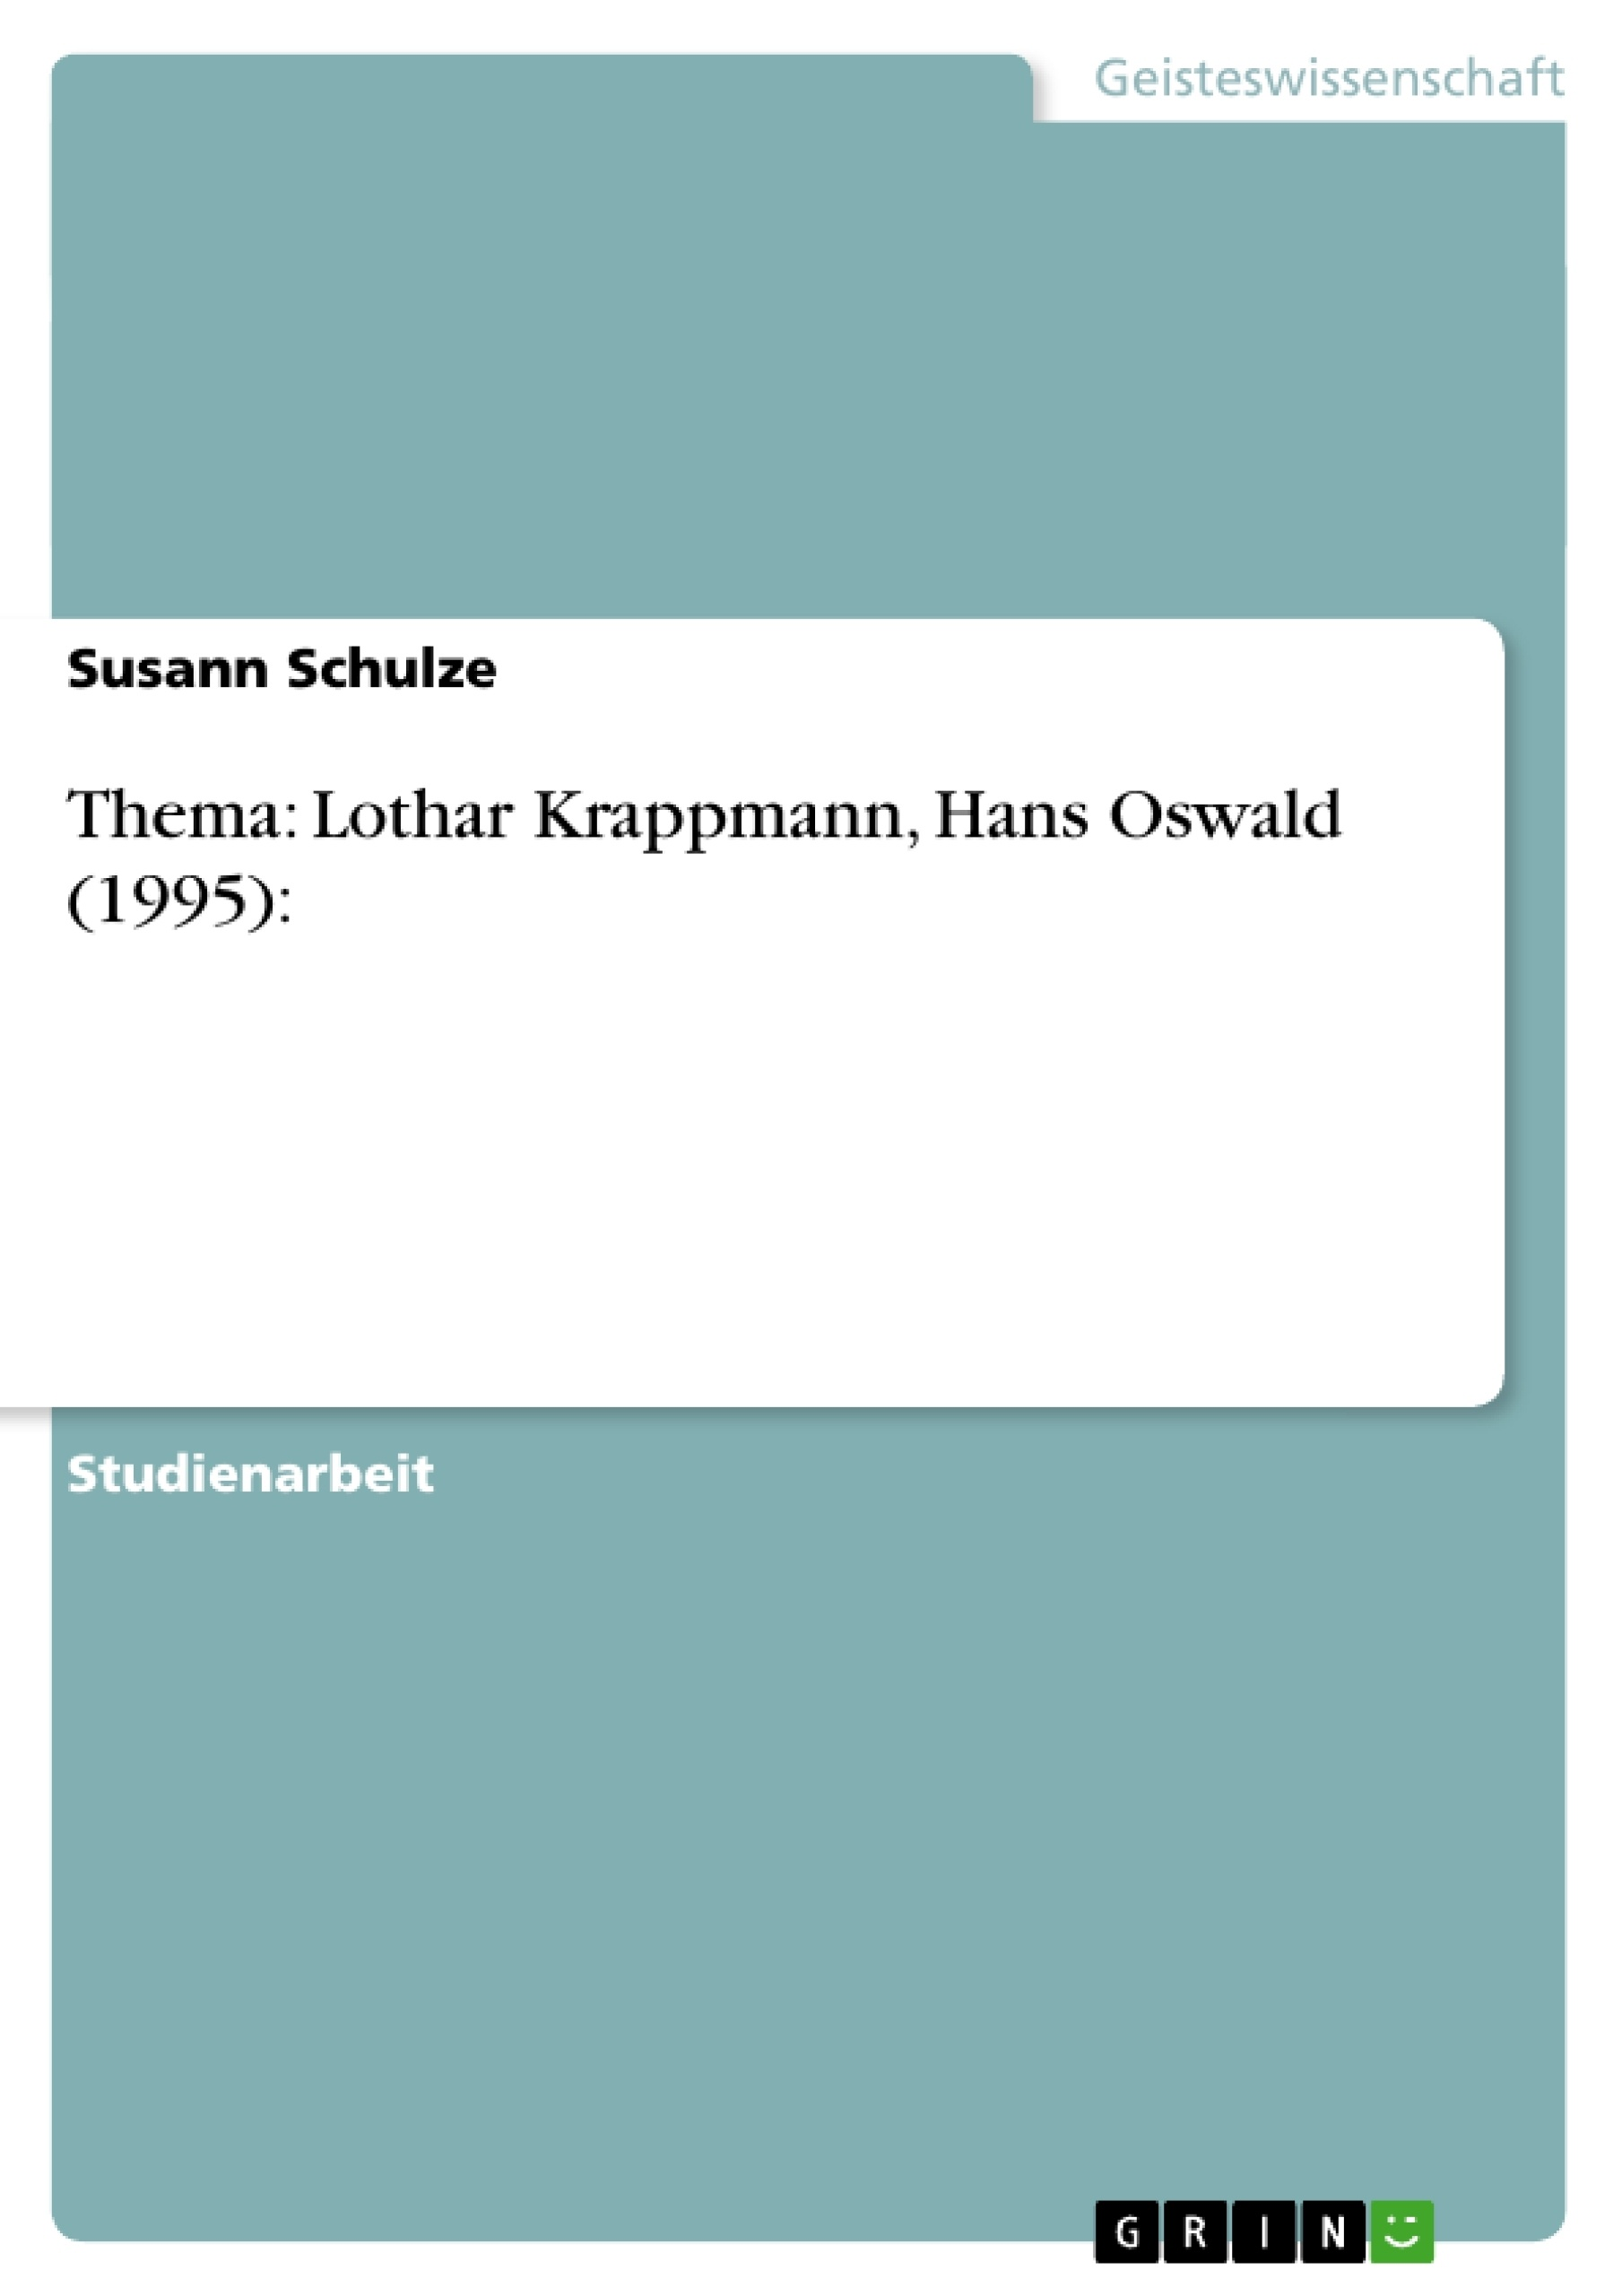 thema lothar krappmann hans oswald 1995 masterarbeit hausarbeit bachelorarbeit. Black Bedroom Furniture Sets. Home Design Ideas